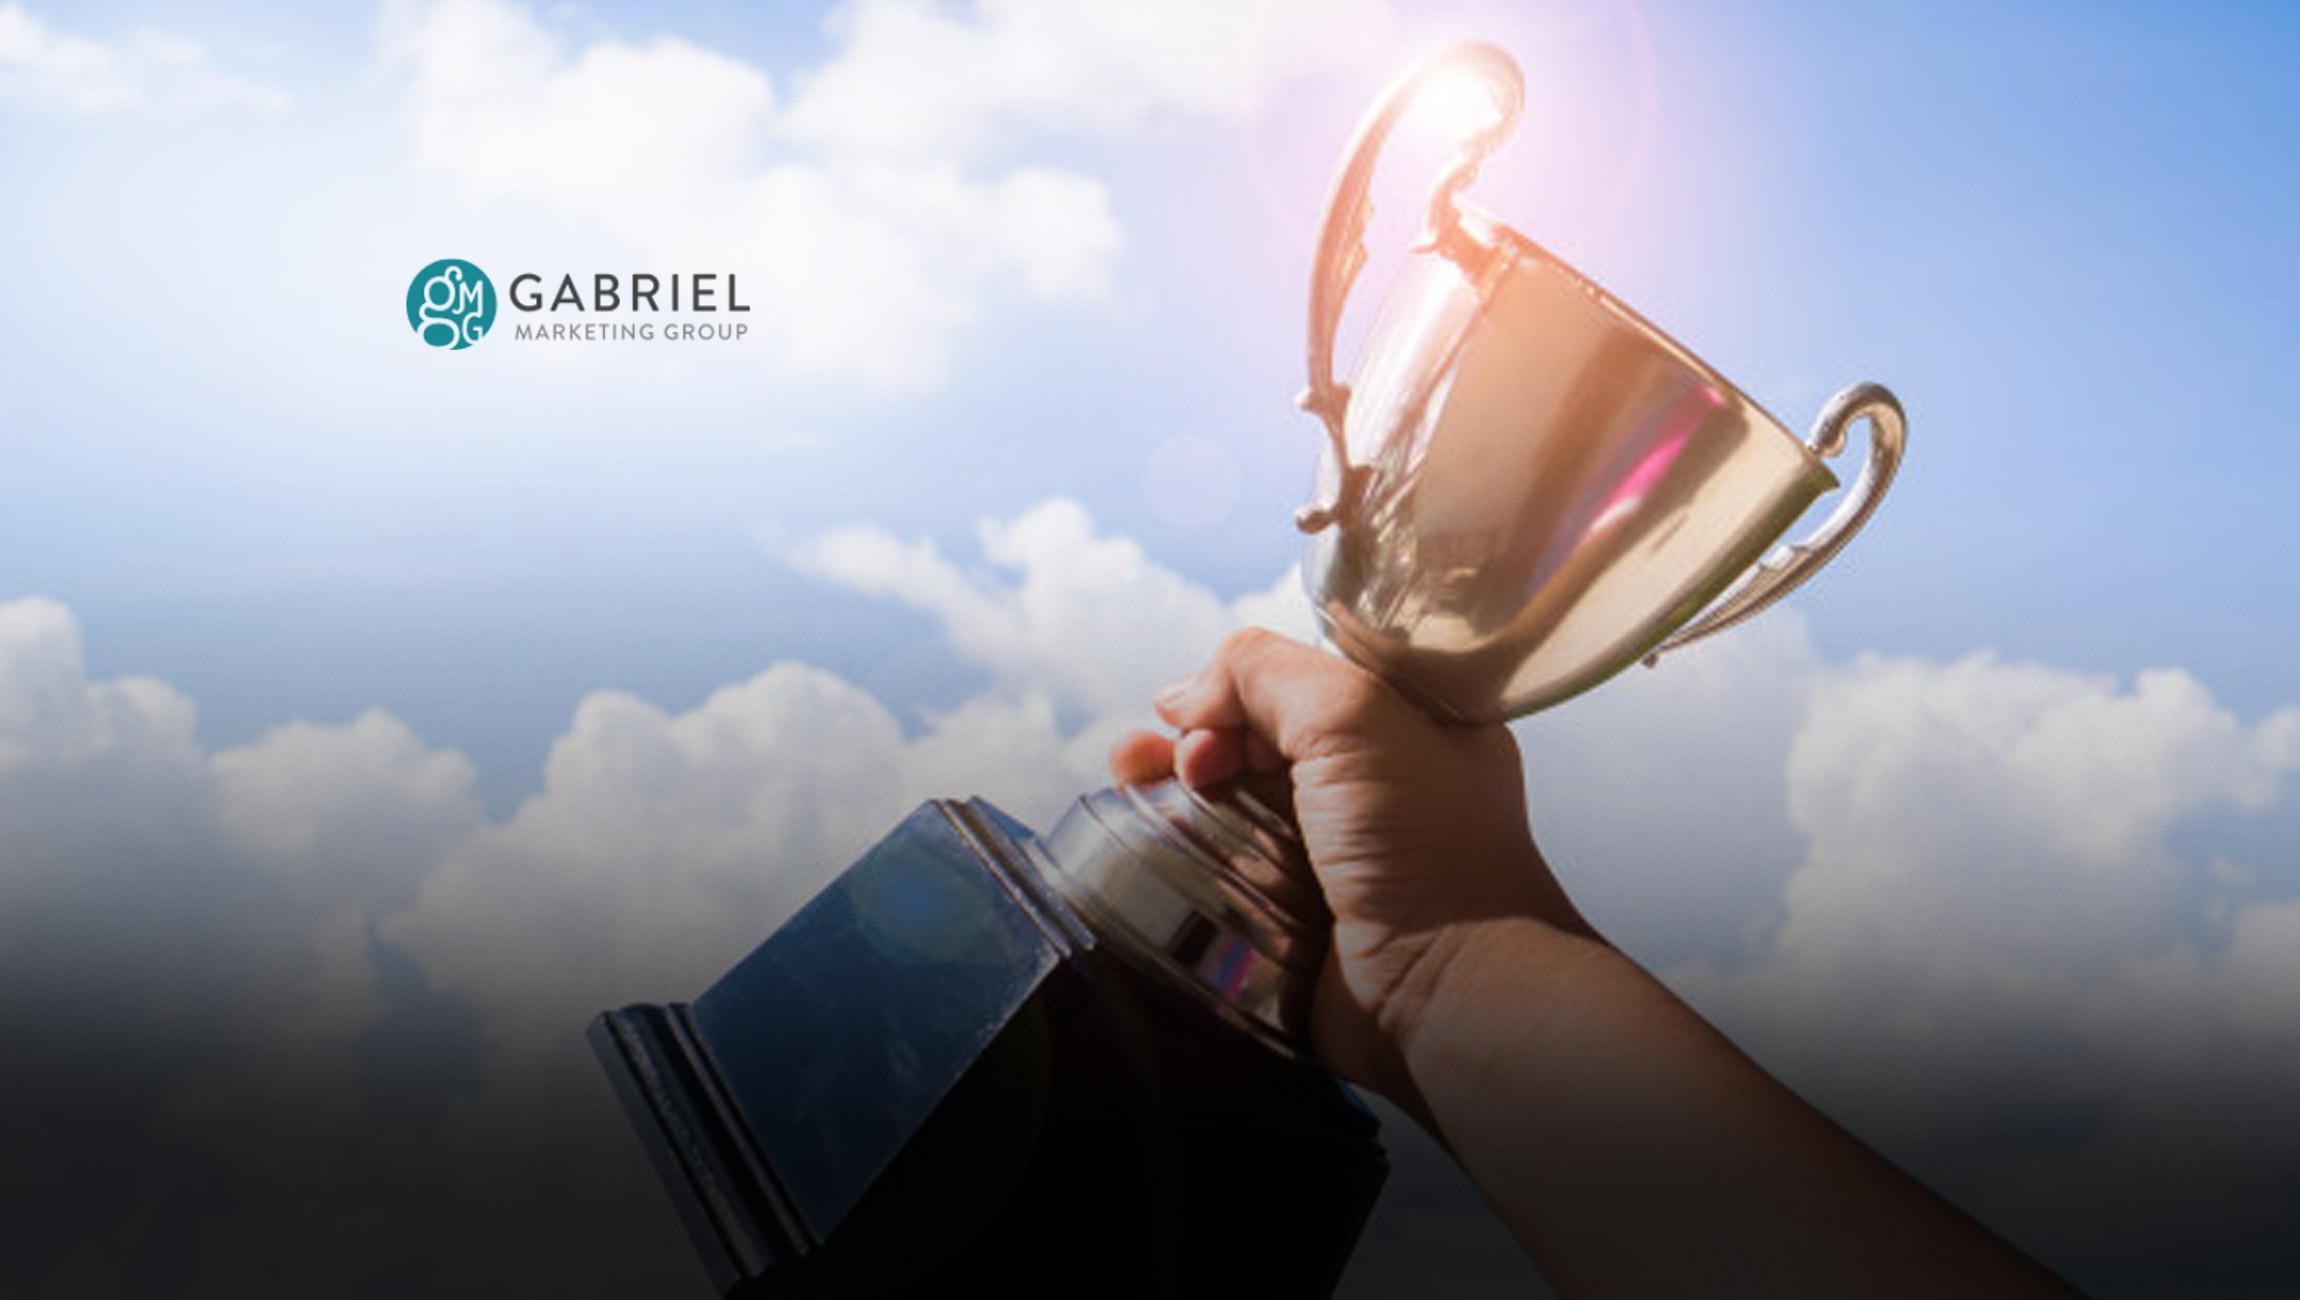 Gabriel-Marketing-Group-Wins-Seven-2021-AVA-Digital-Awards